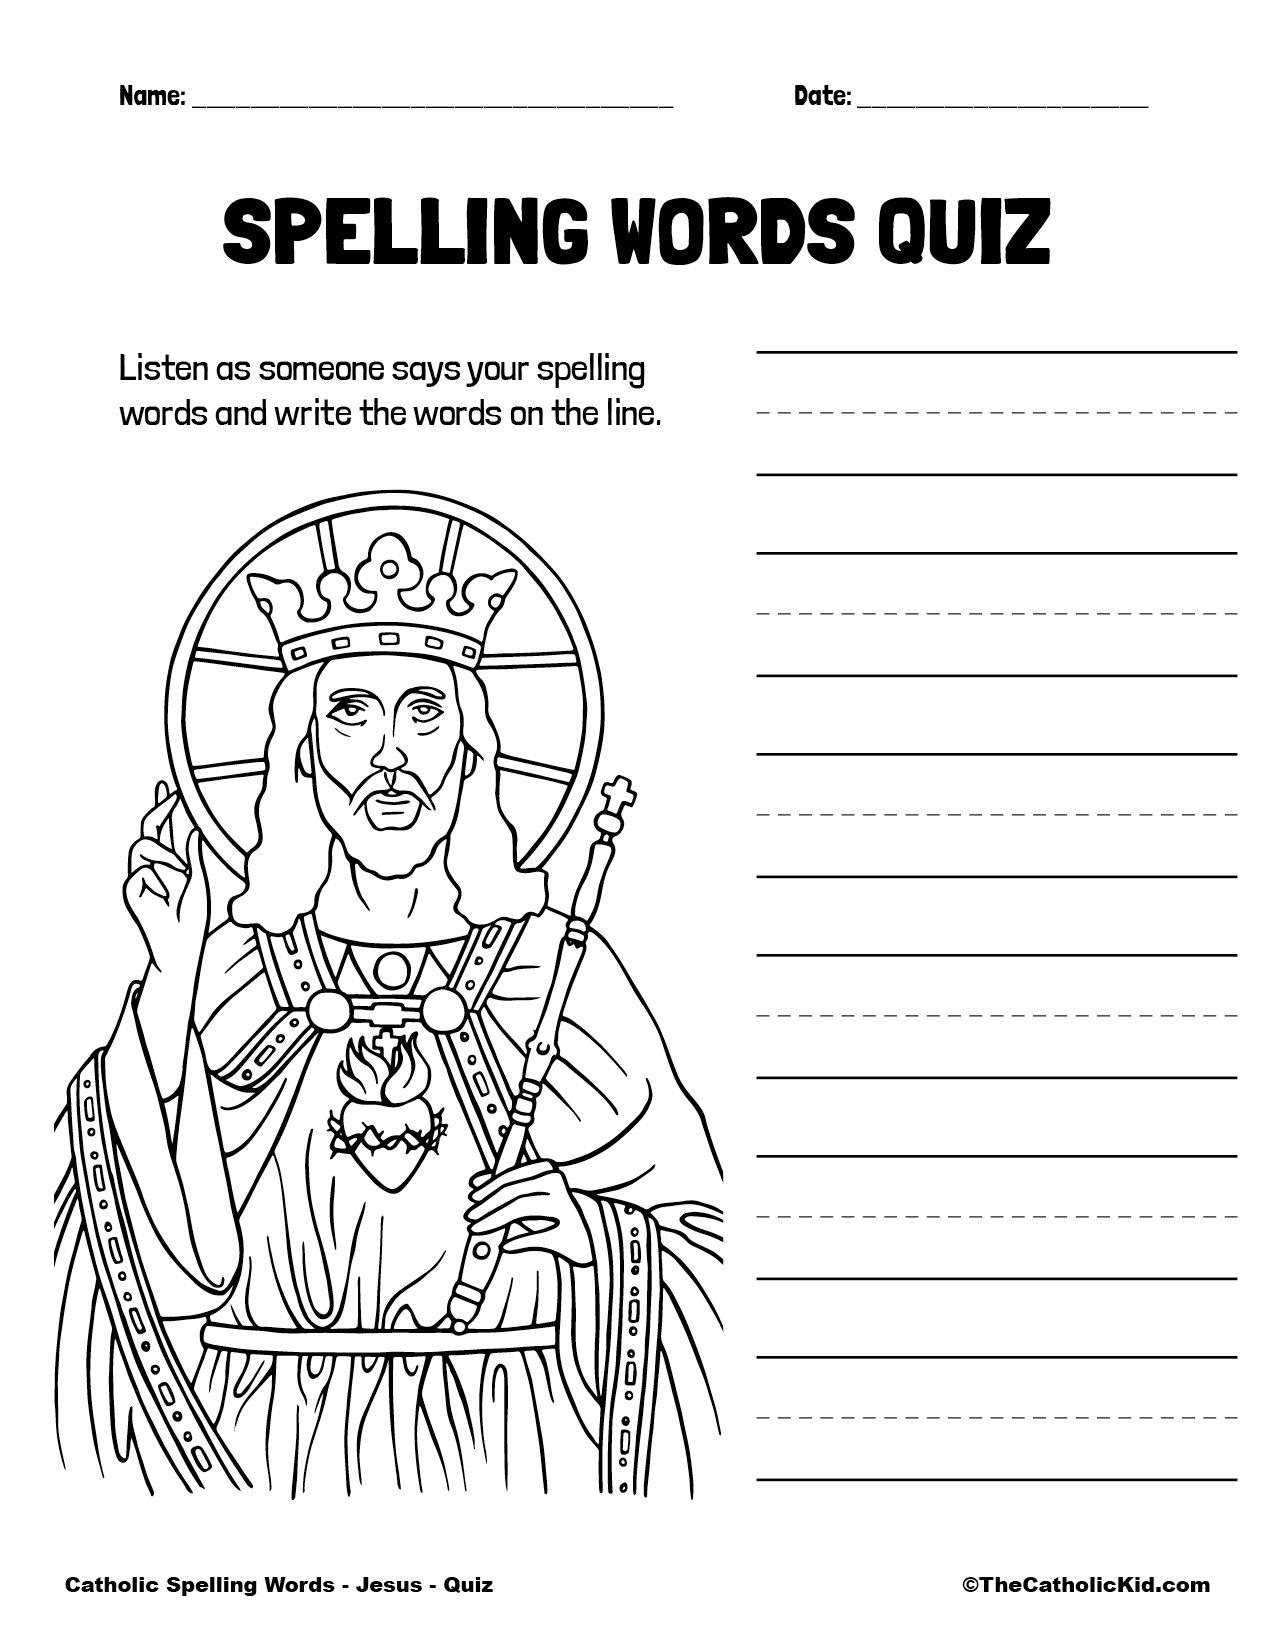 Catholic Spelling & Vocabulary Words Jesus Worksheet 5 Quiz